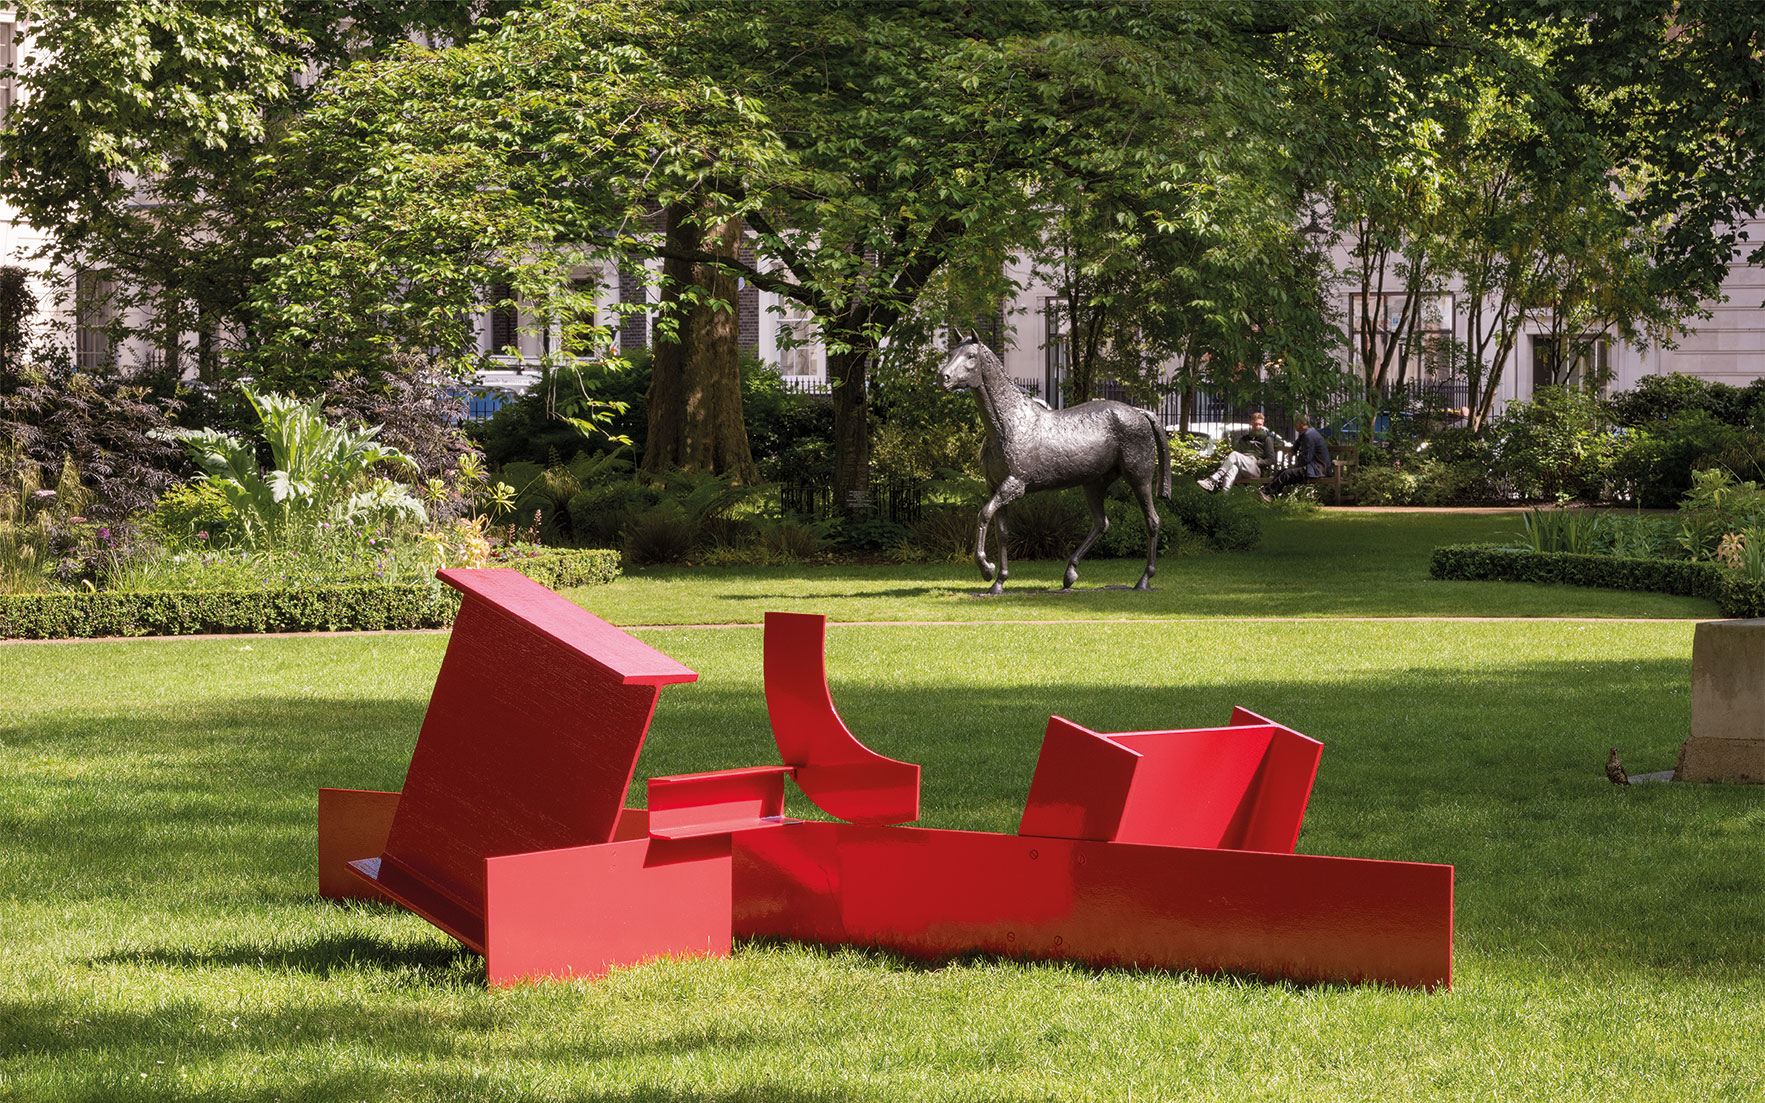 Sculpture in the Square &mdash